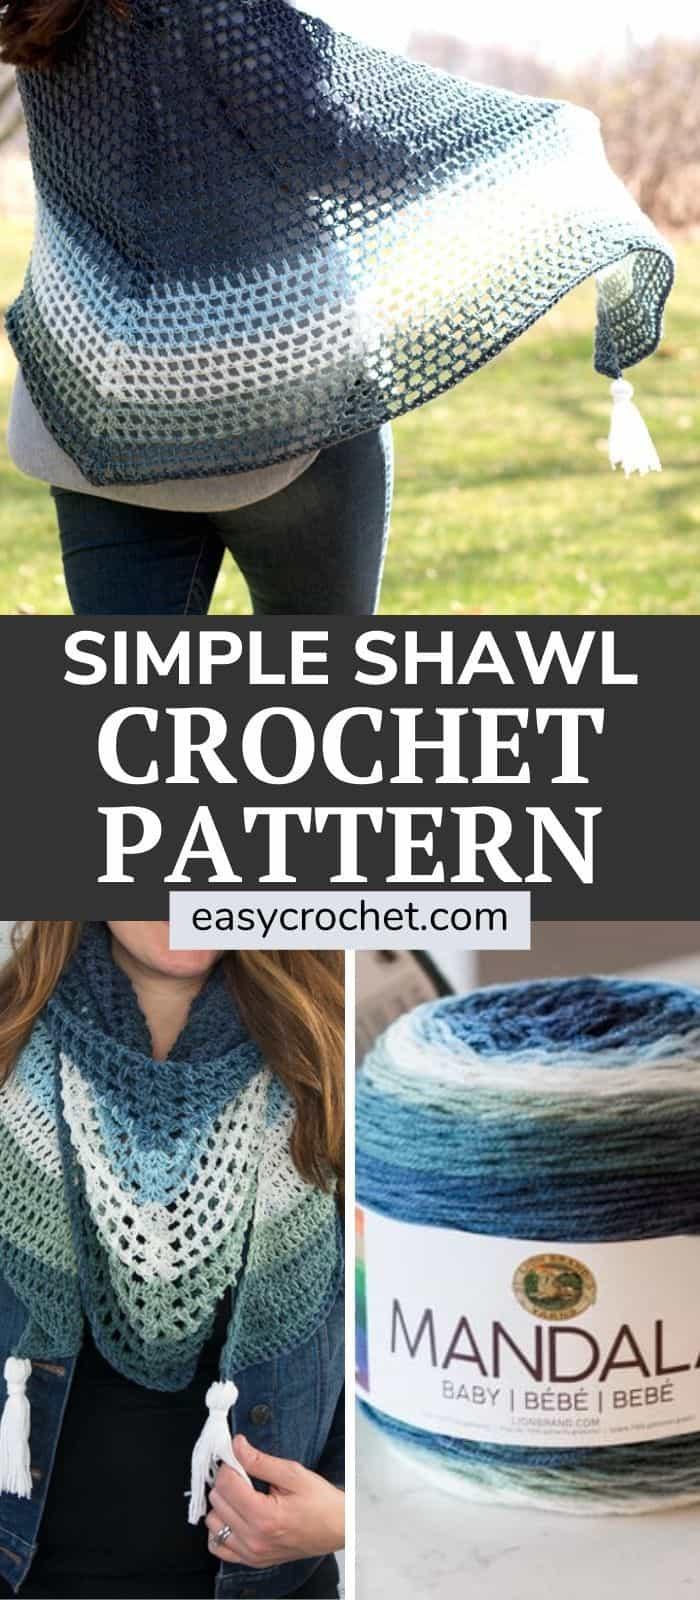 Simple Shawl crochet pattern using Mandala Yarn via @easycrochetcom